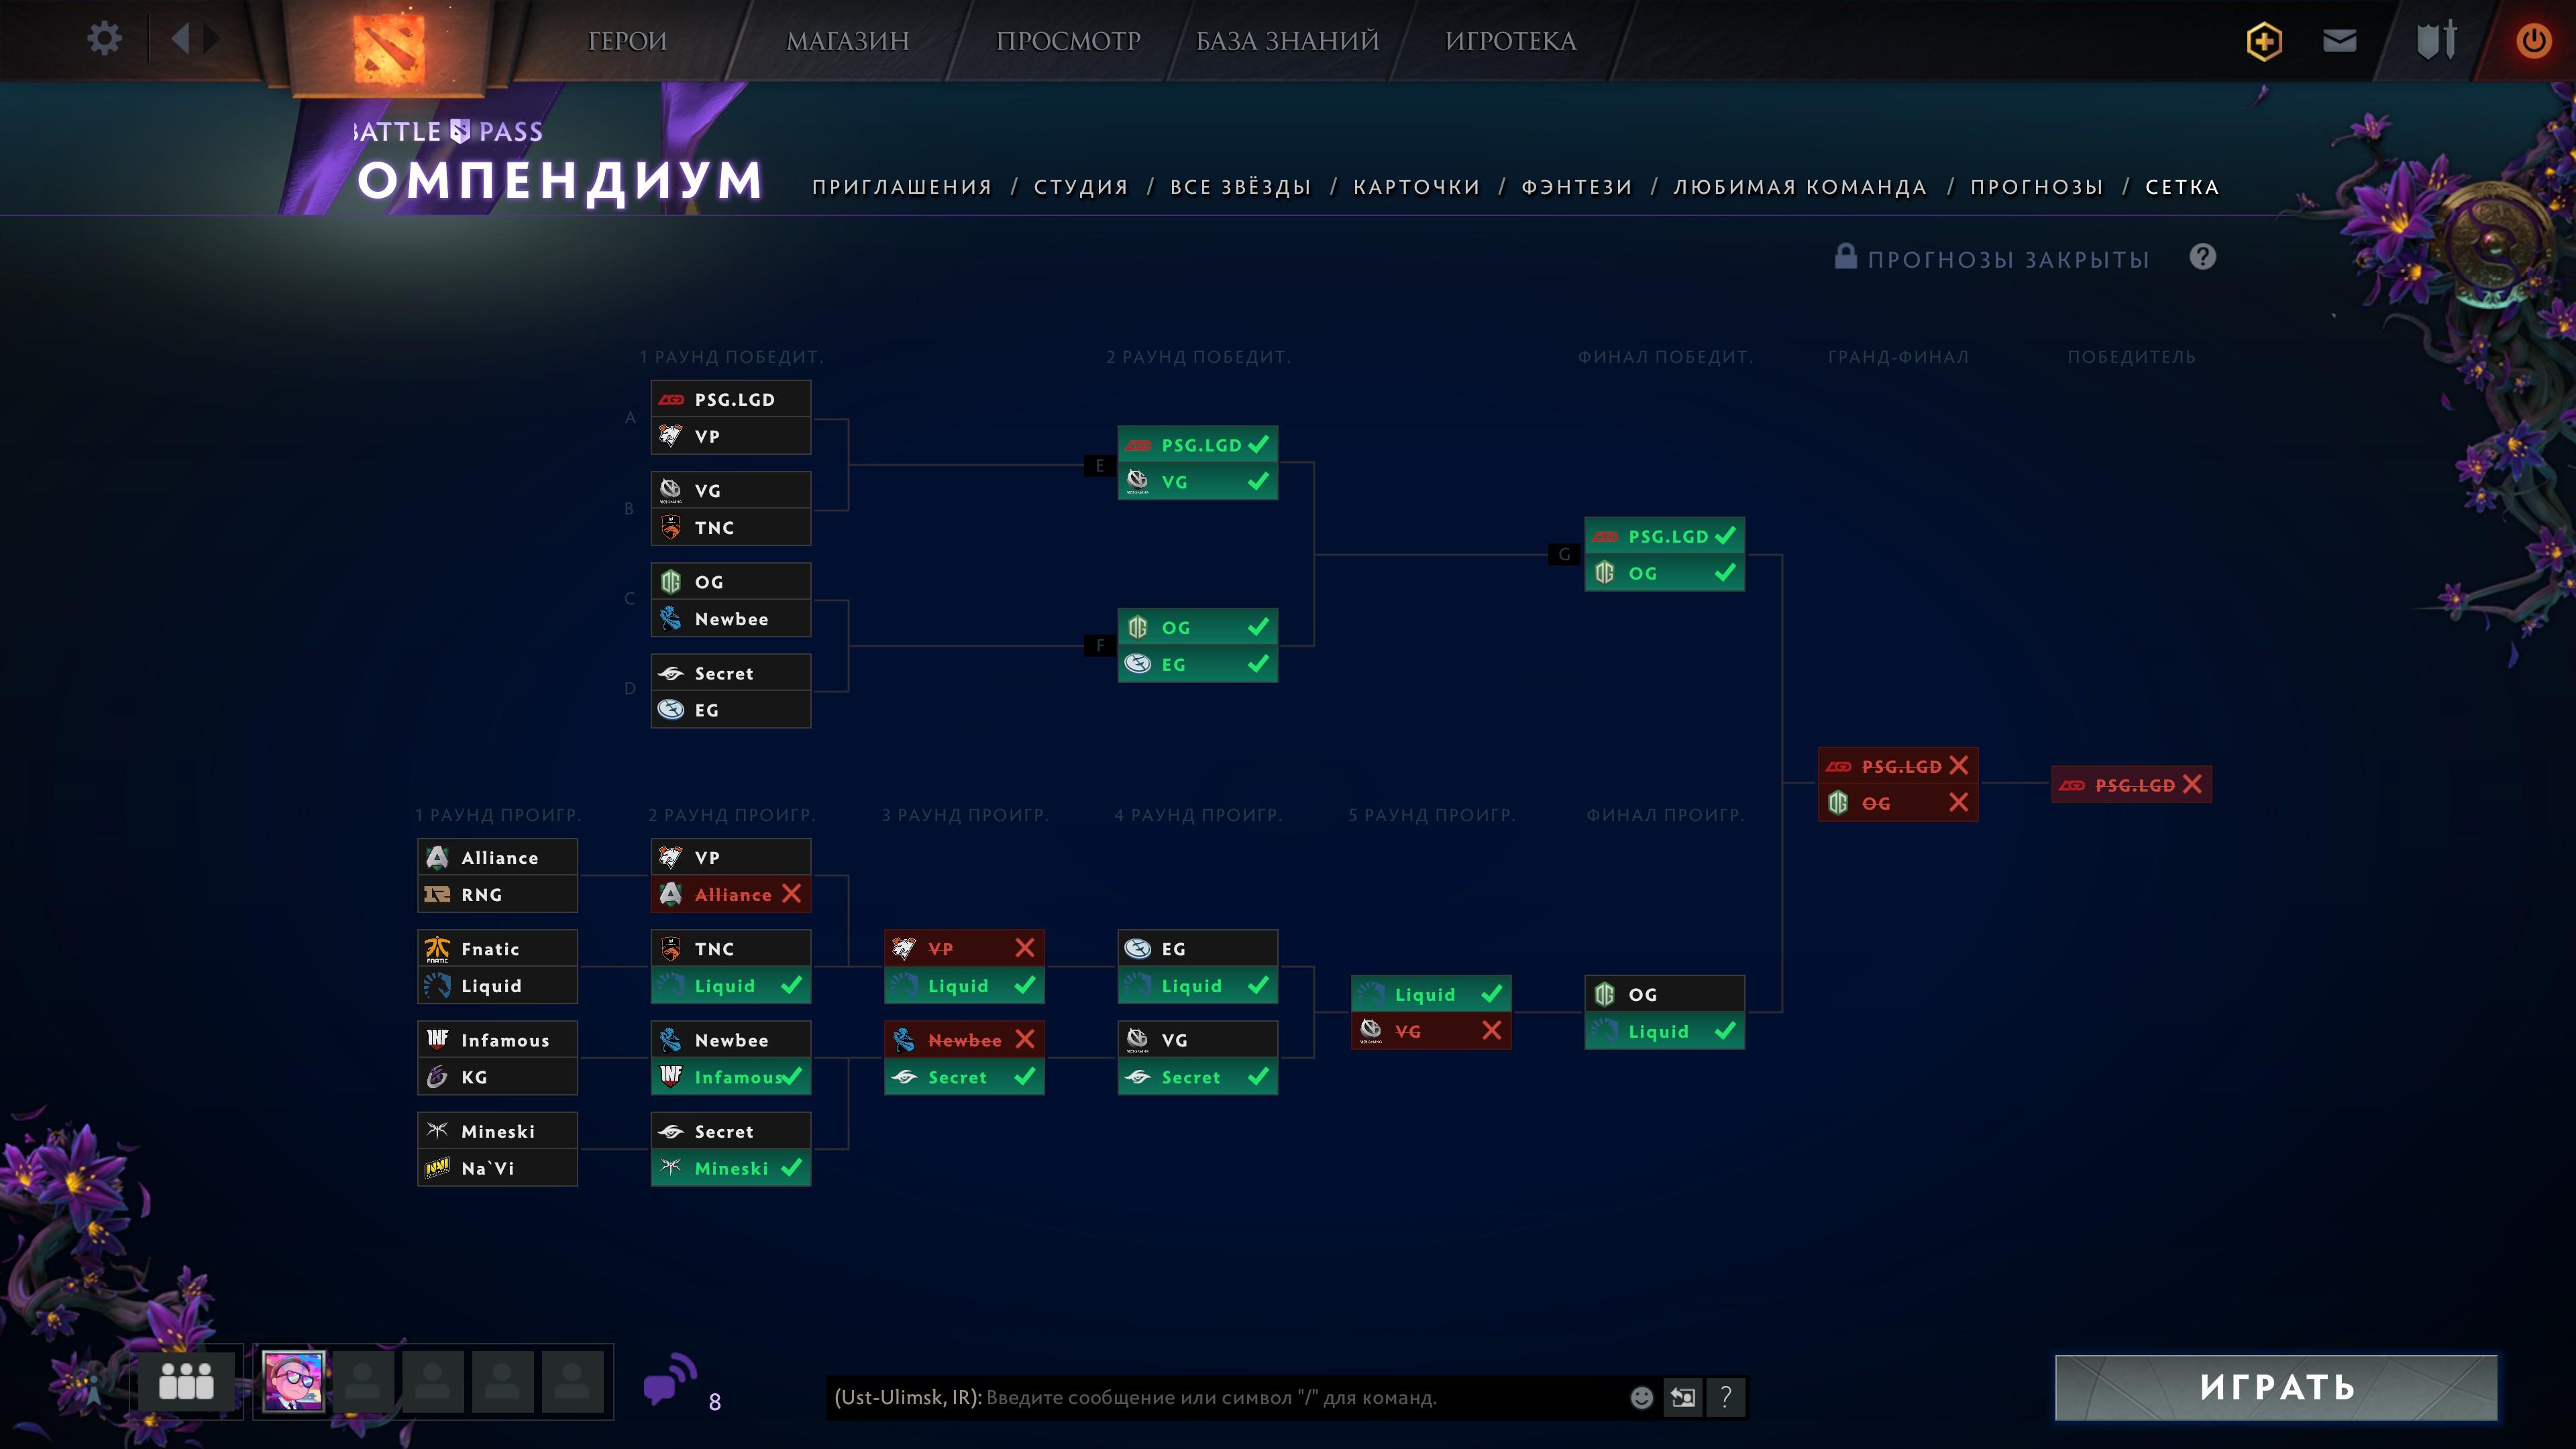 Matchmaking exploits DotA 2